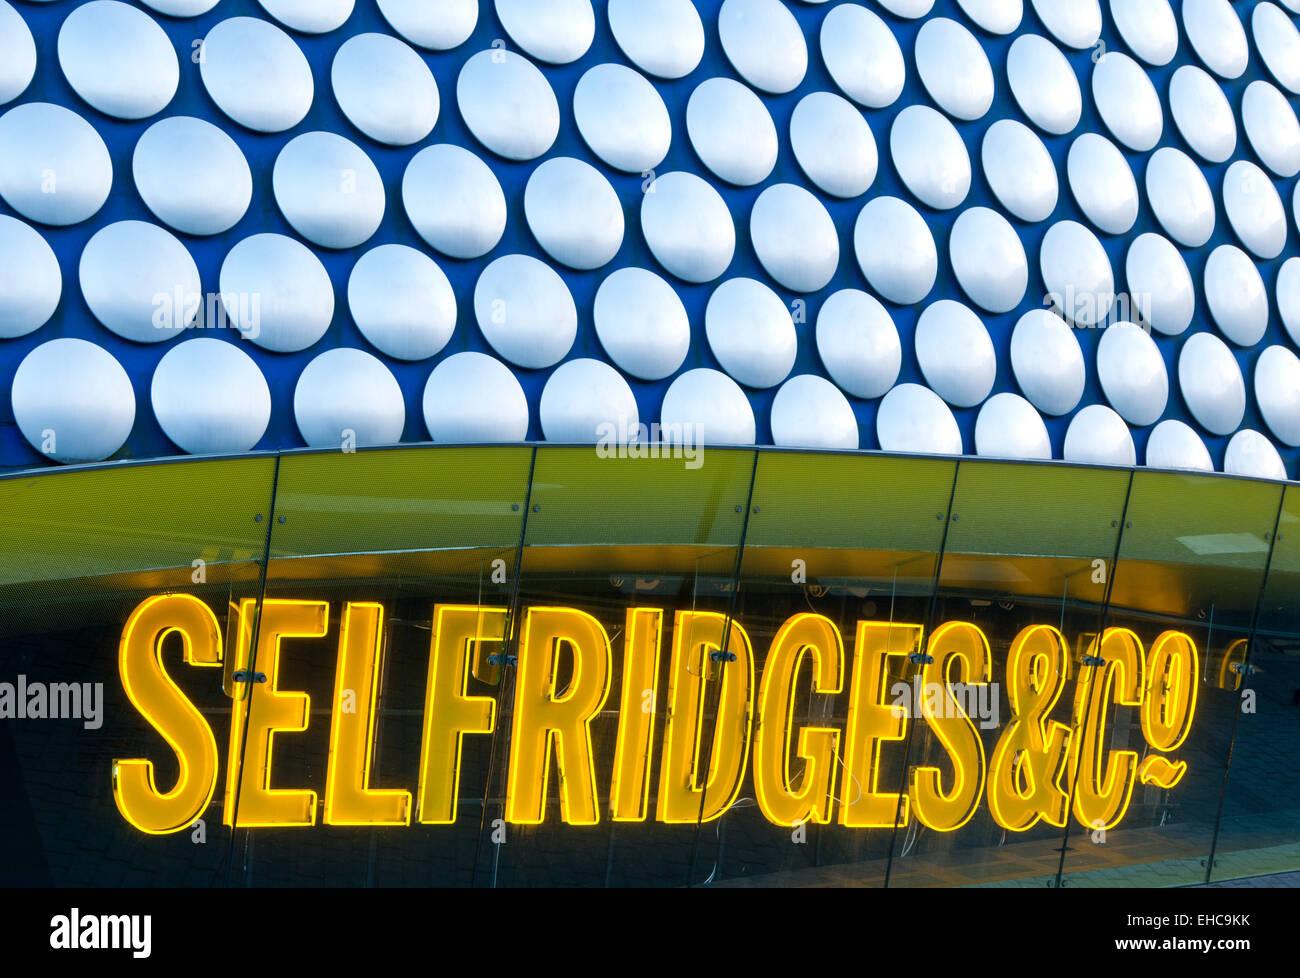 Exterior of Selfridges Department Store, Birmingham City Centre, West Midlands, England, UK Stock Photo